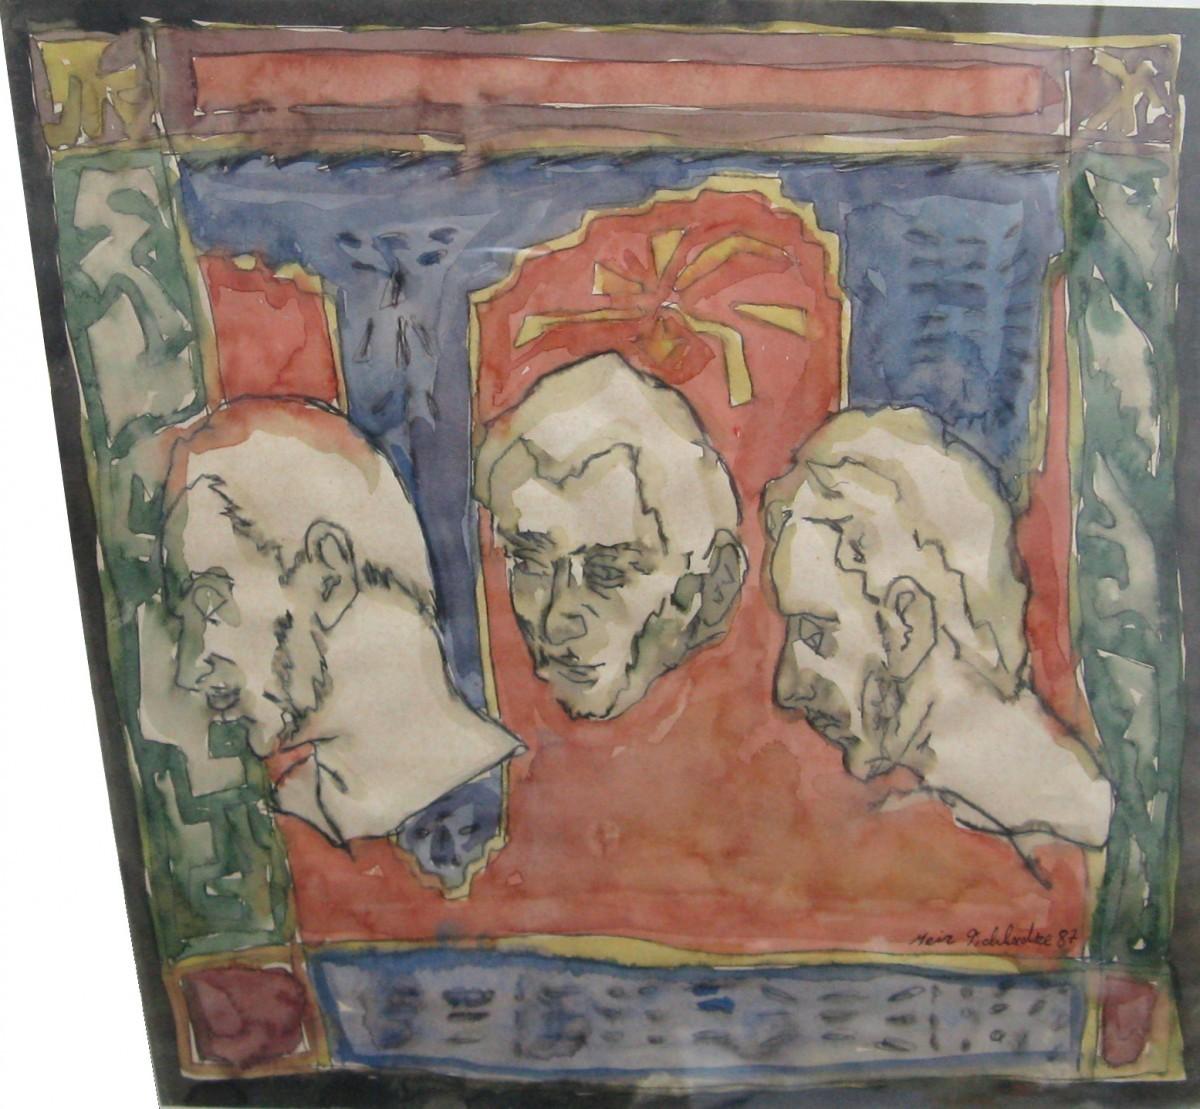 S-162, Meir Pichhadze, Watercolor, 34x37 cm 2,200$